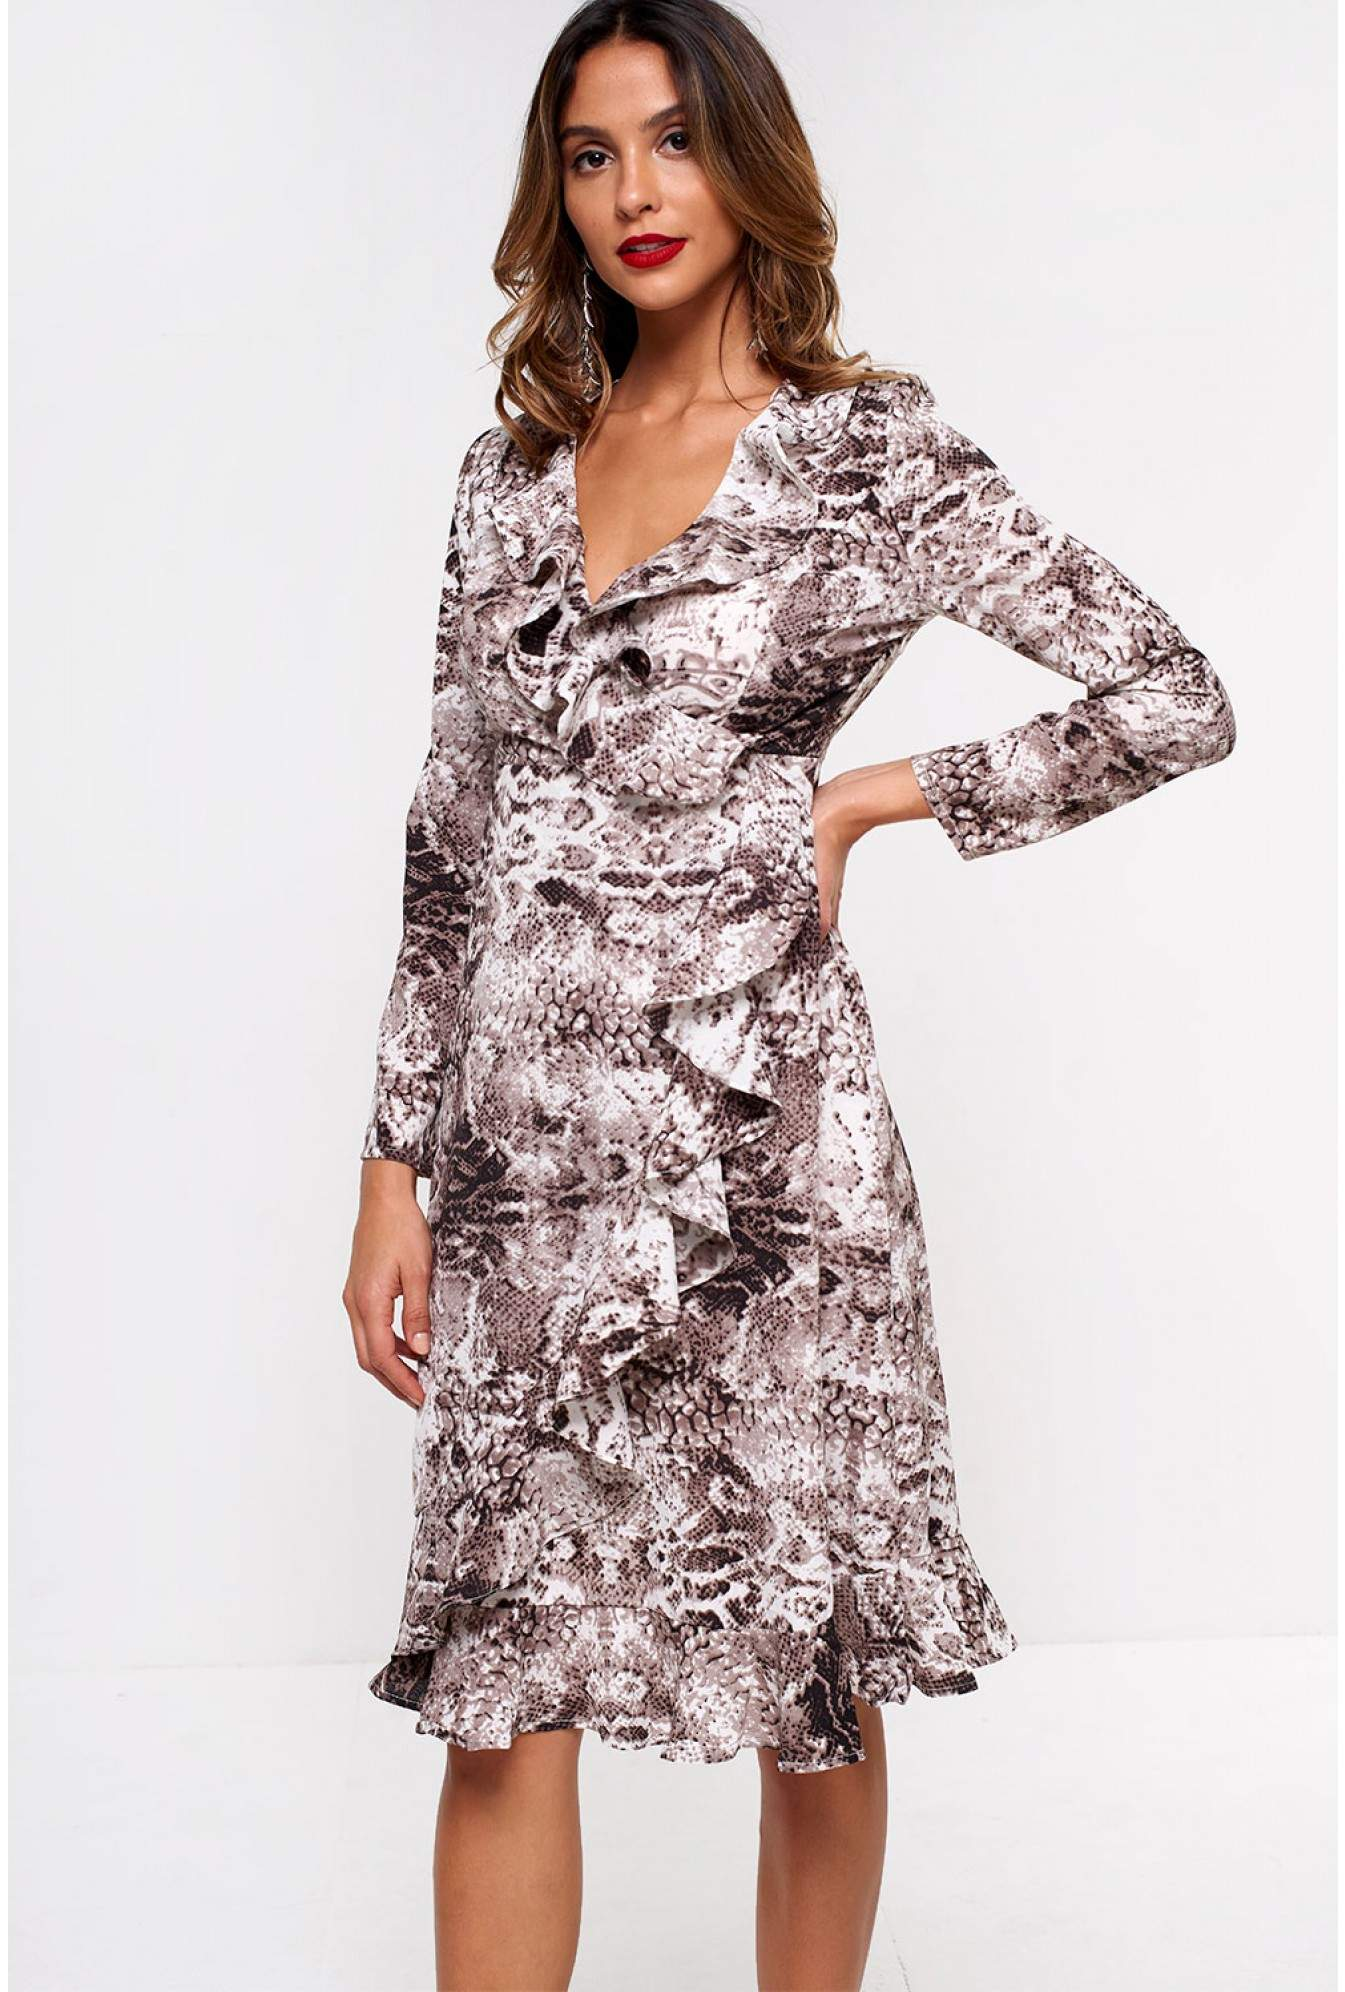 95ccf5fbaab6 Stella Cleo Frill Wrap Midi Dress in Snakeskin Print | iCLOTHING